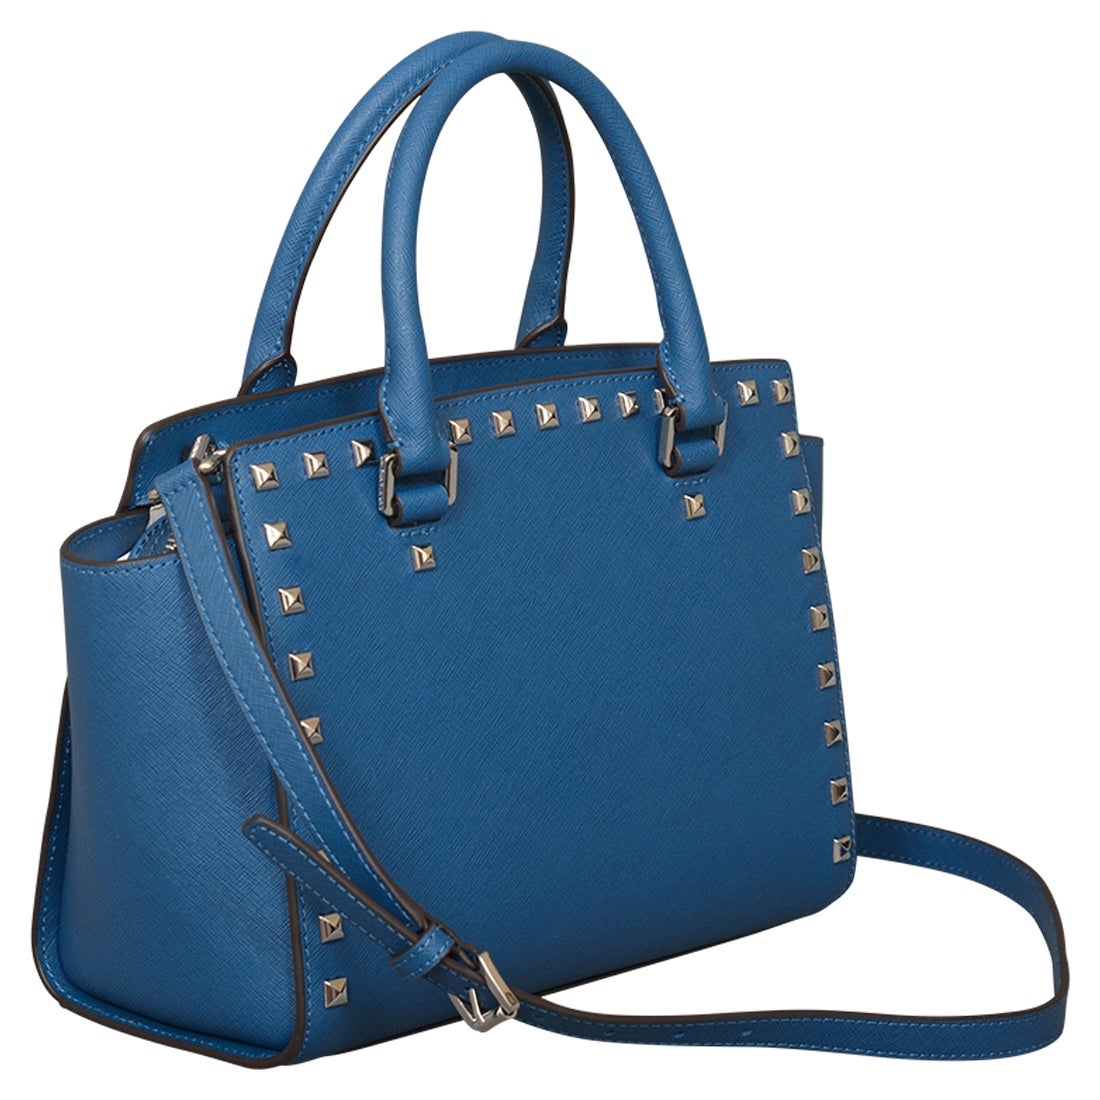 48234825a0b2 Shop Michael Kors Medium Selma Stud Top Zip Steel Blue Leather Satchel  Handbag - Free Shipping Today - Overstock - 22678795